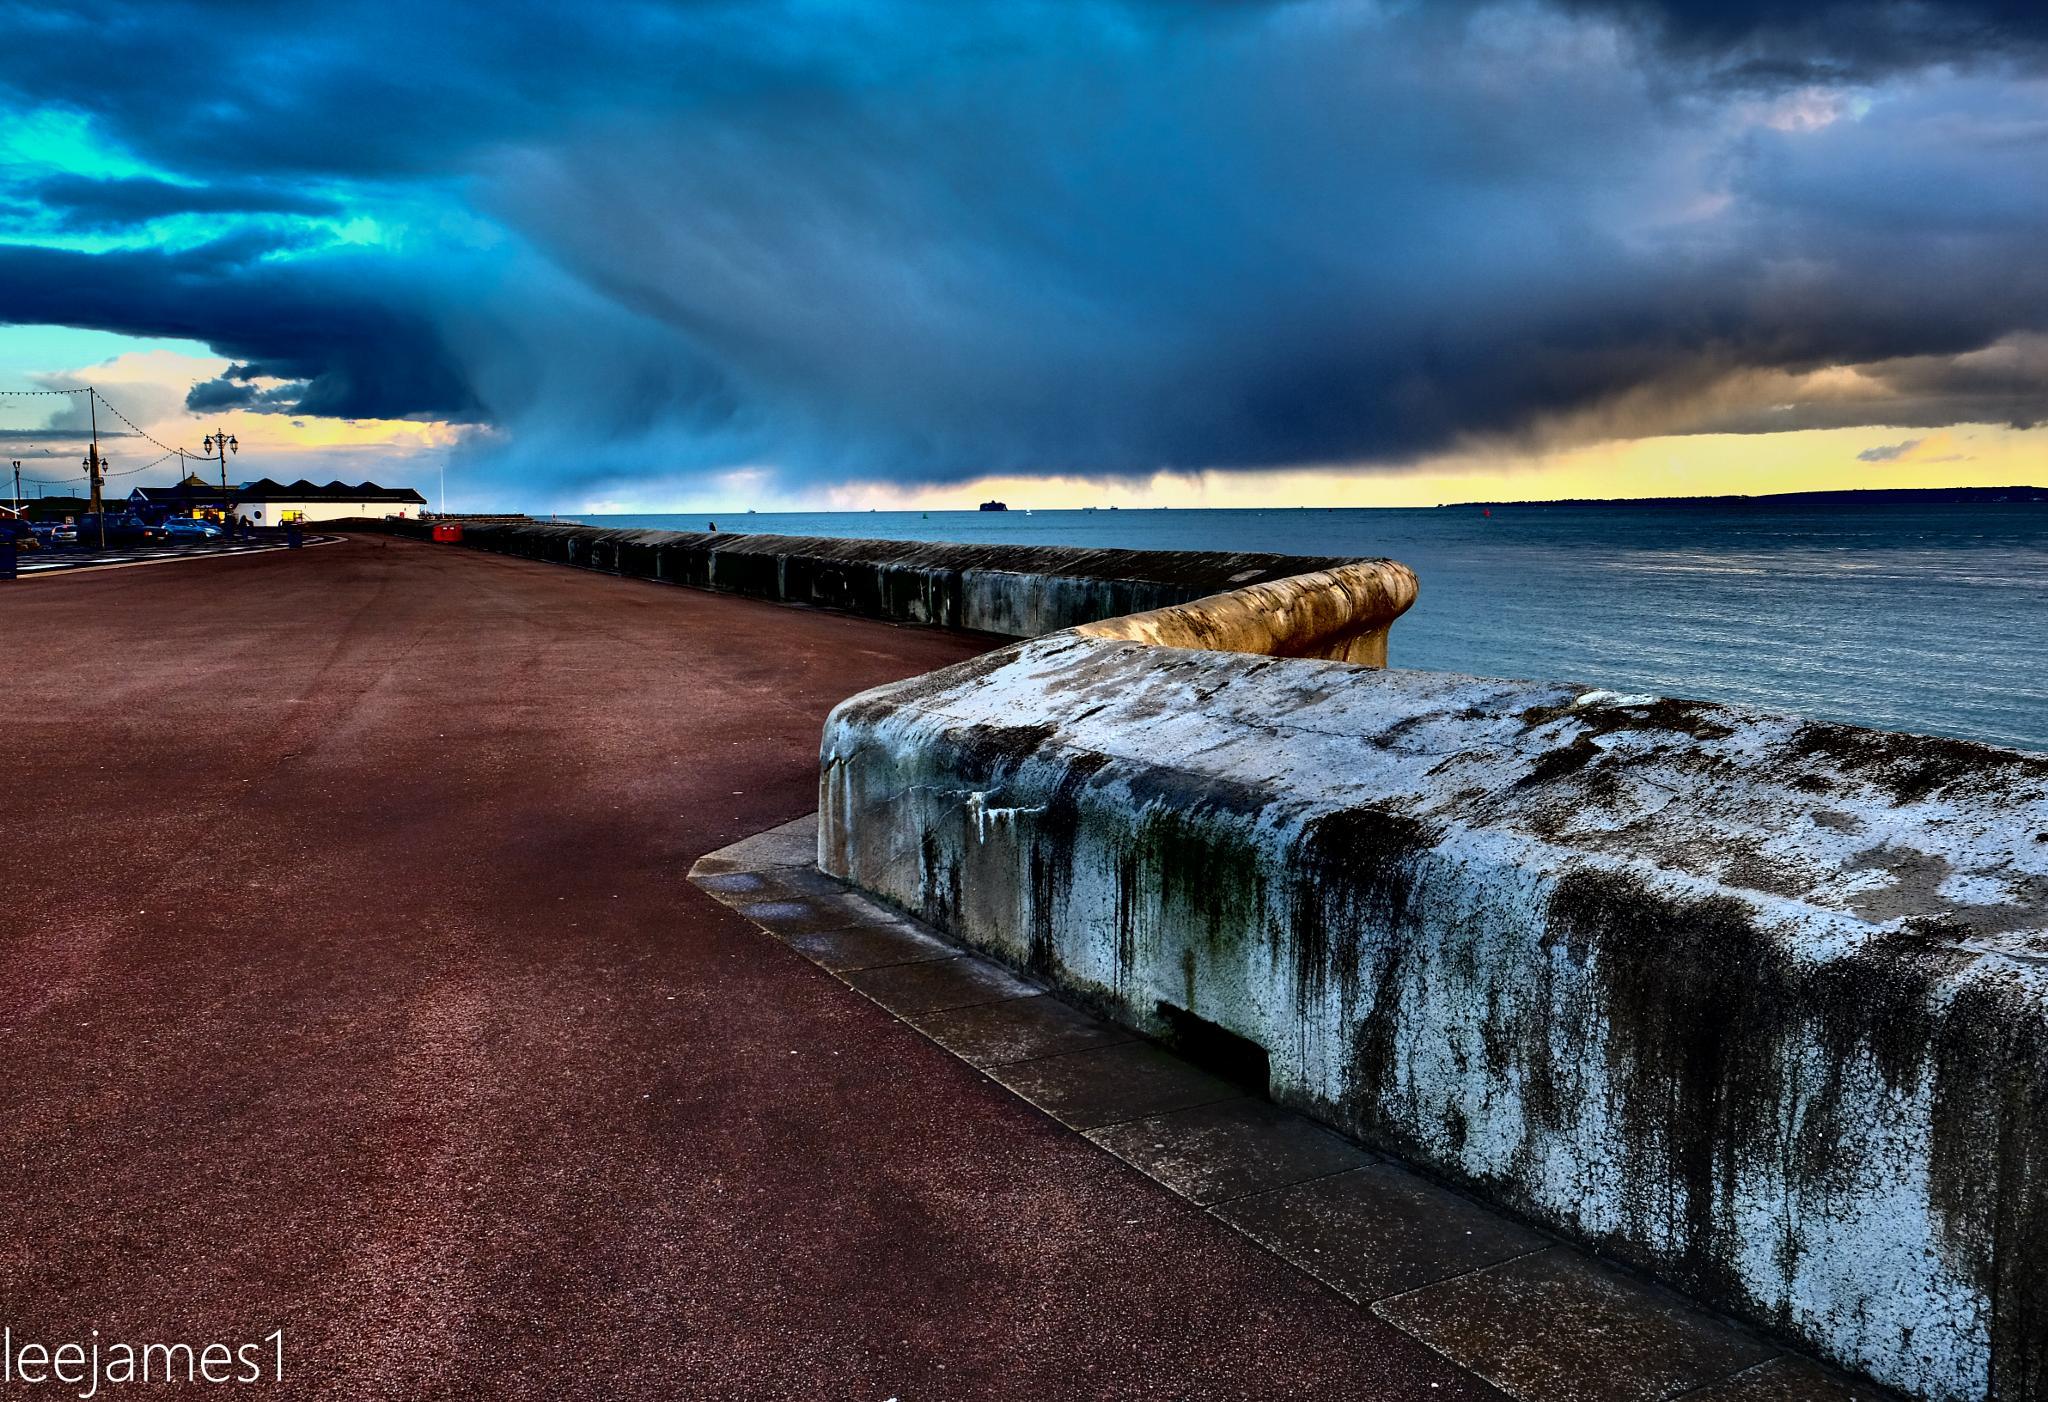 Sea Defences by leejamesphotography